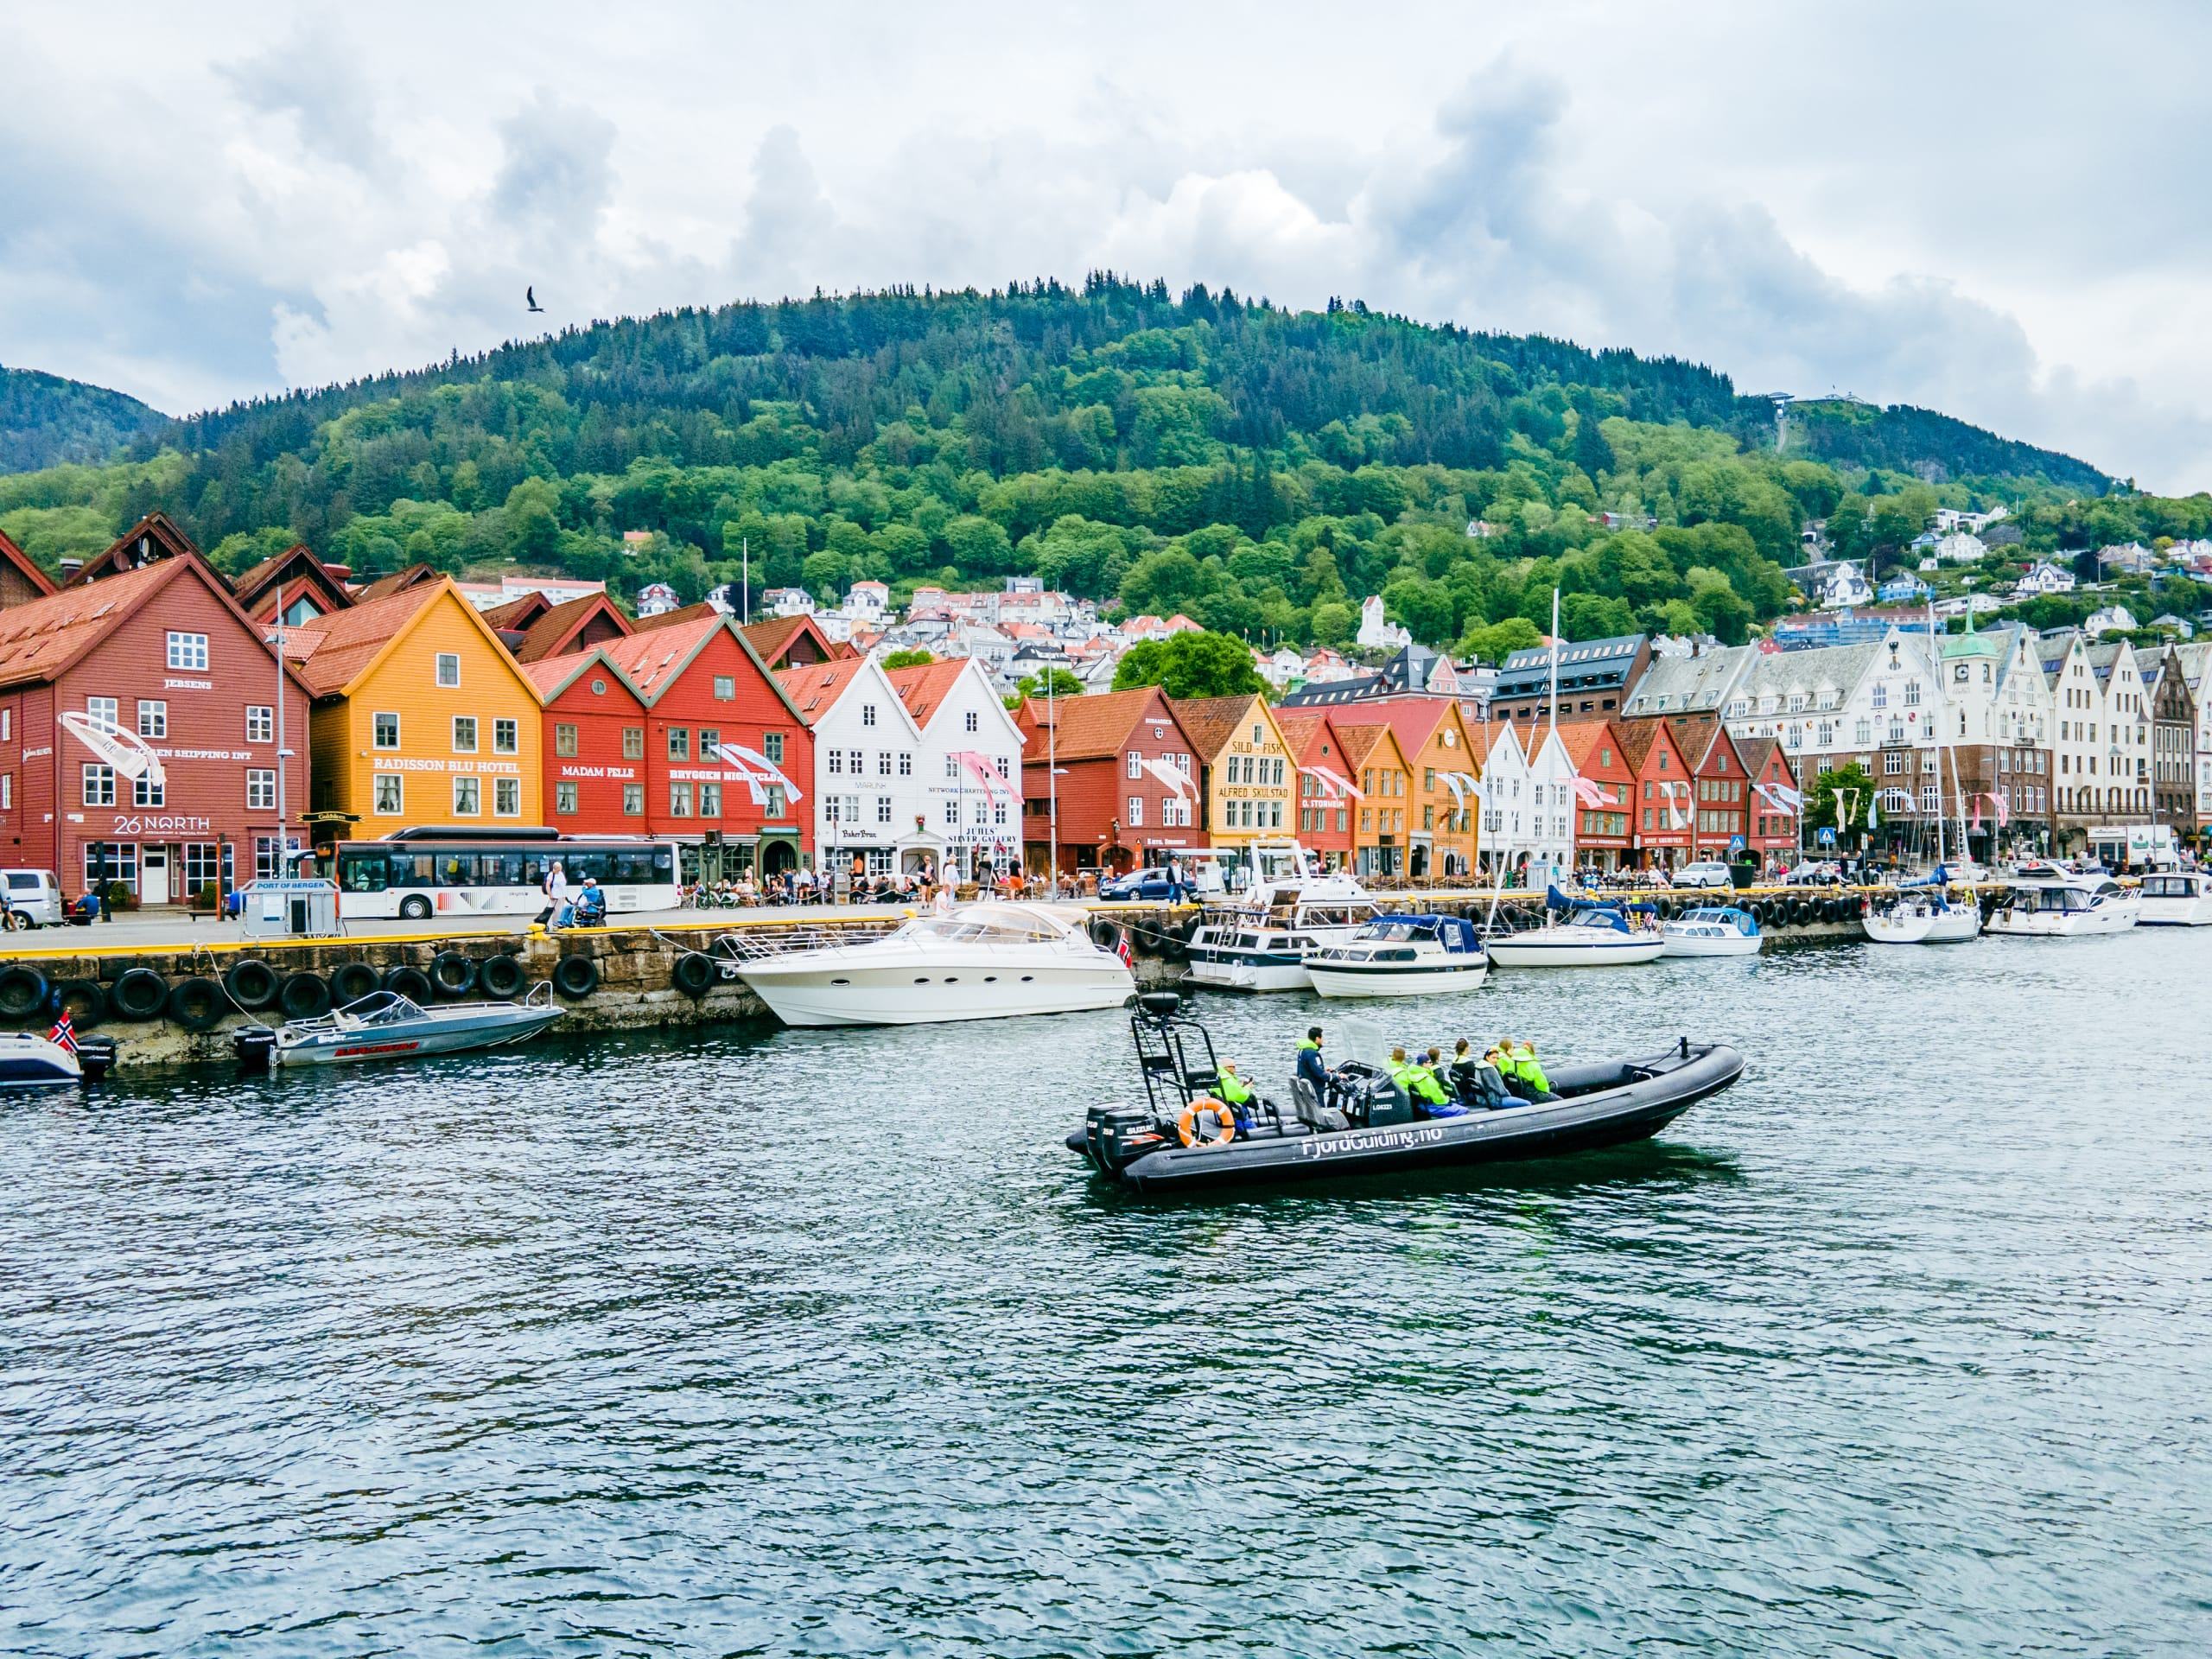 RIB boat cruising in Vågen in front of Bryggen Wharf